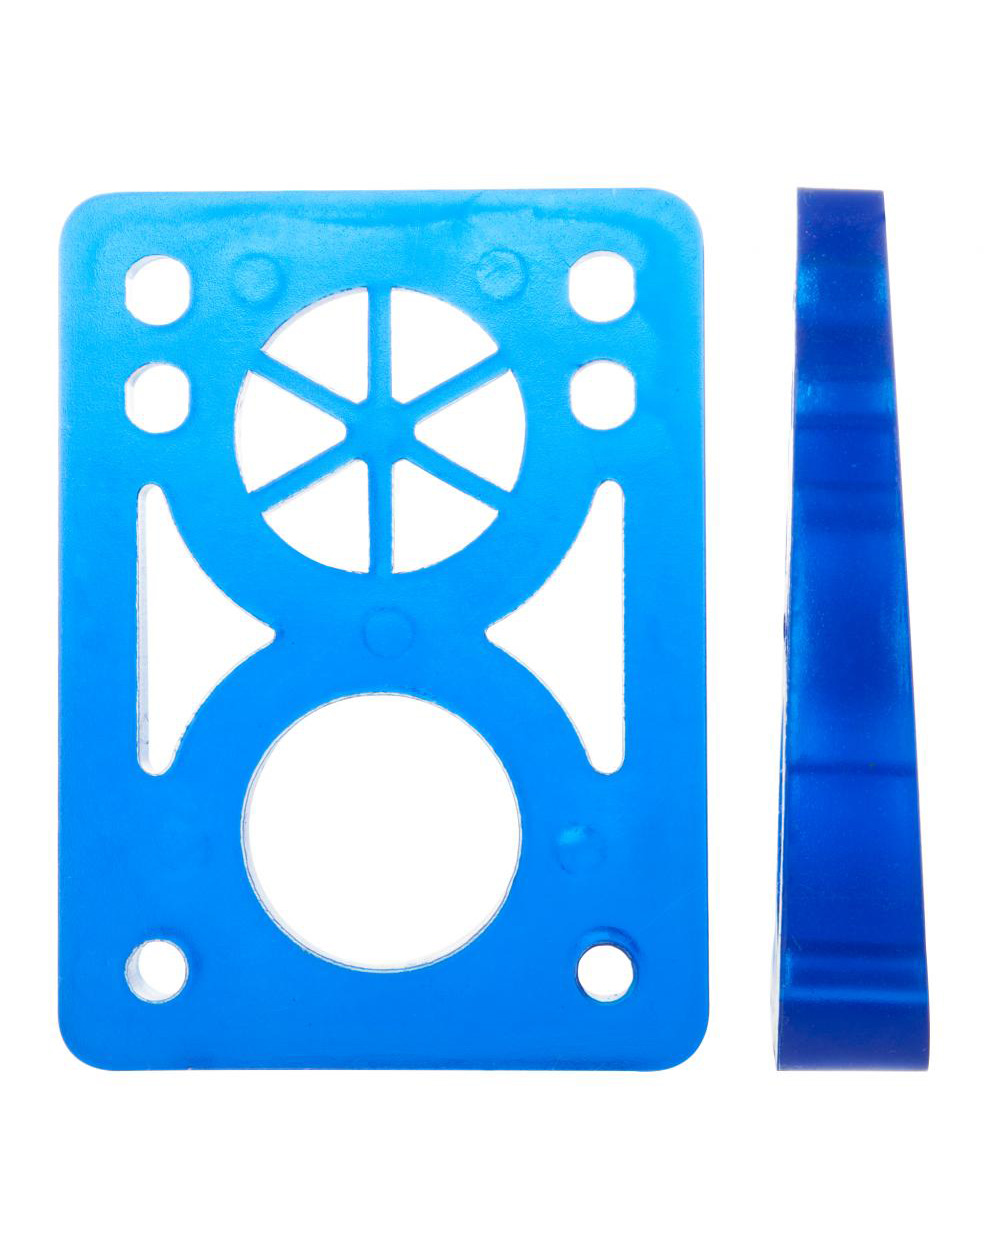 D-Street Pads Skate Soft Wedge 8 to 14 mm Clear Blue 2 peças